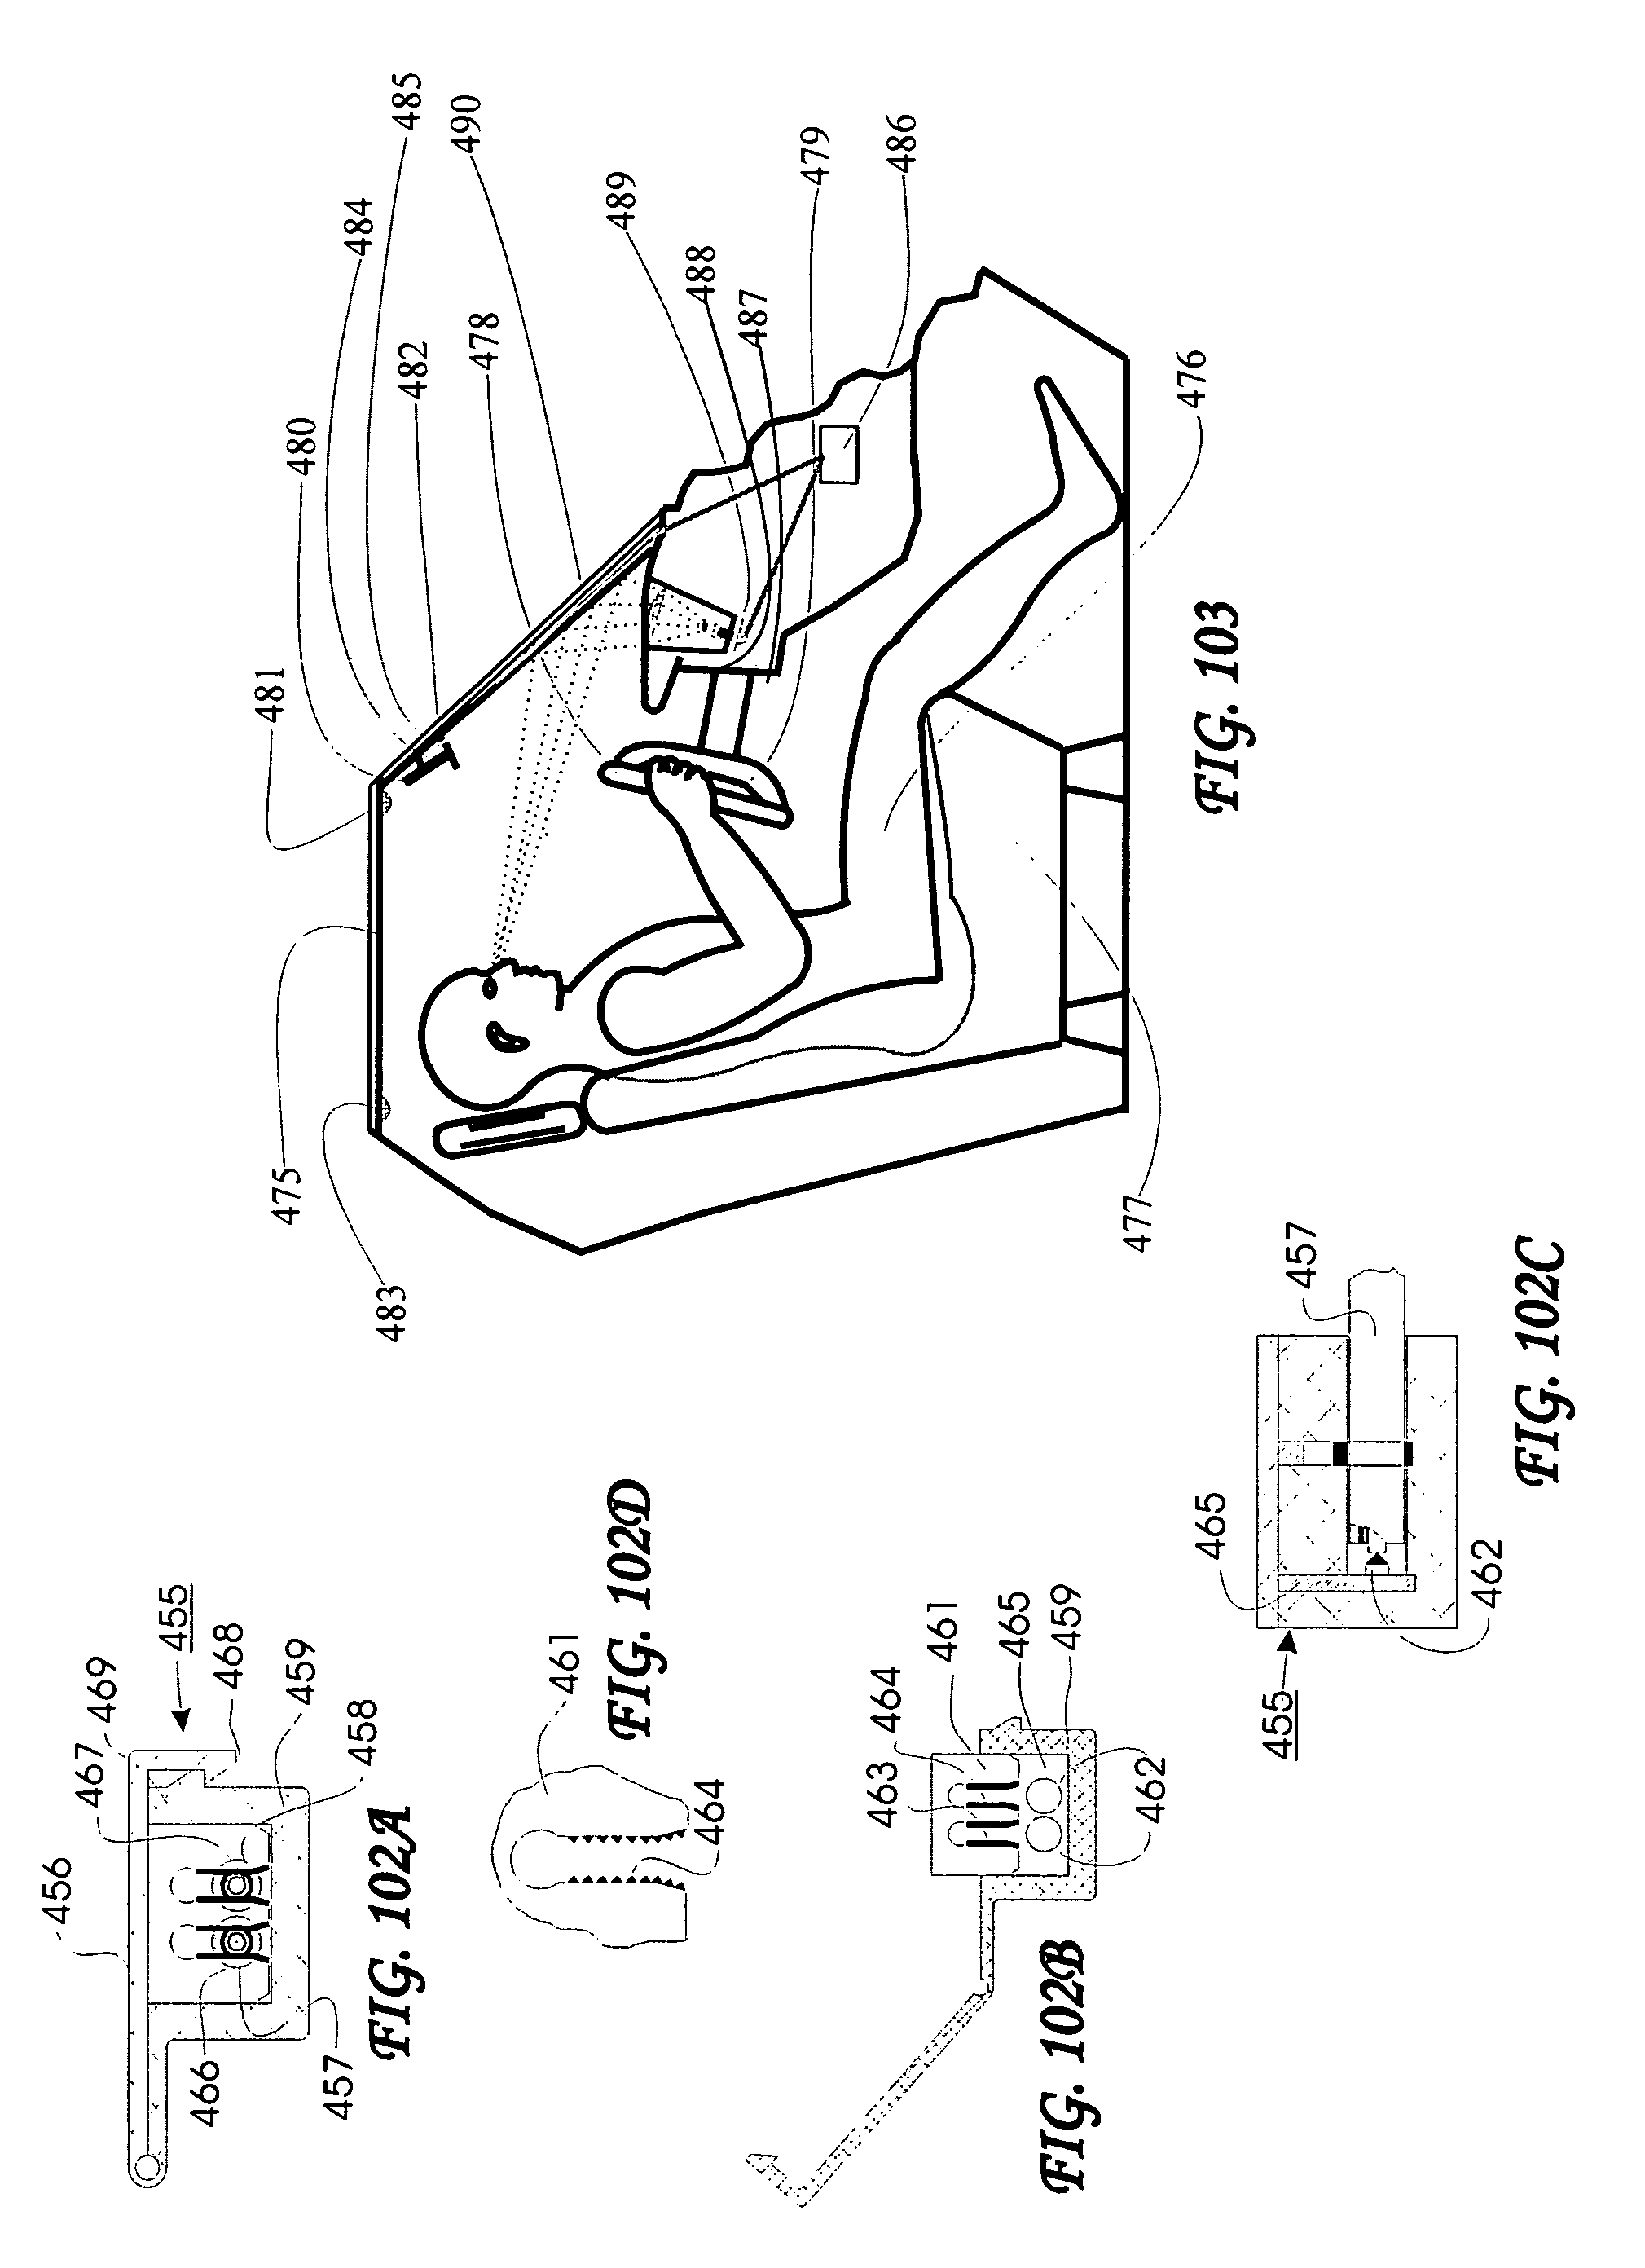 patent us 7 103 460 b1 High Leg Delta patent images